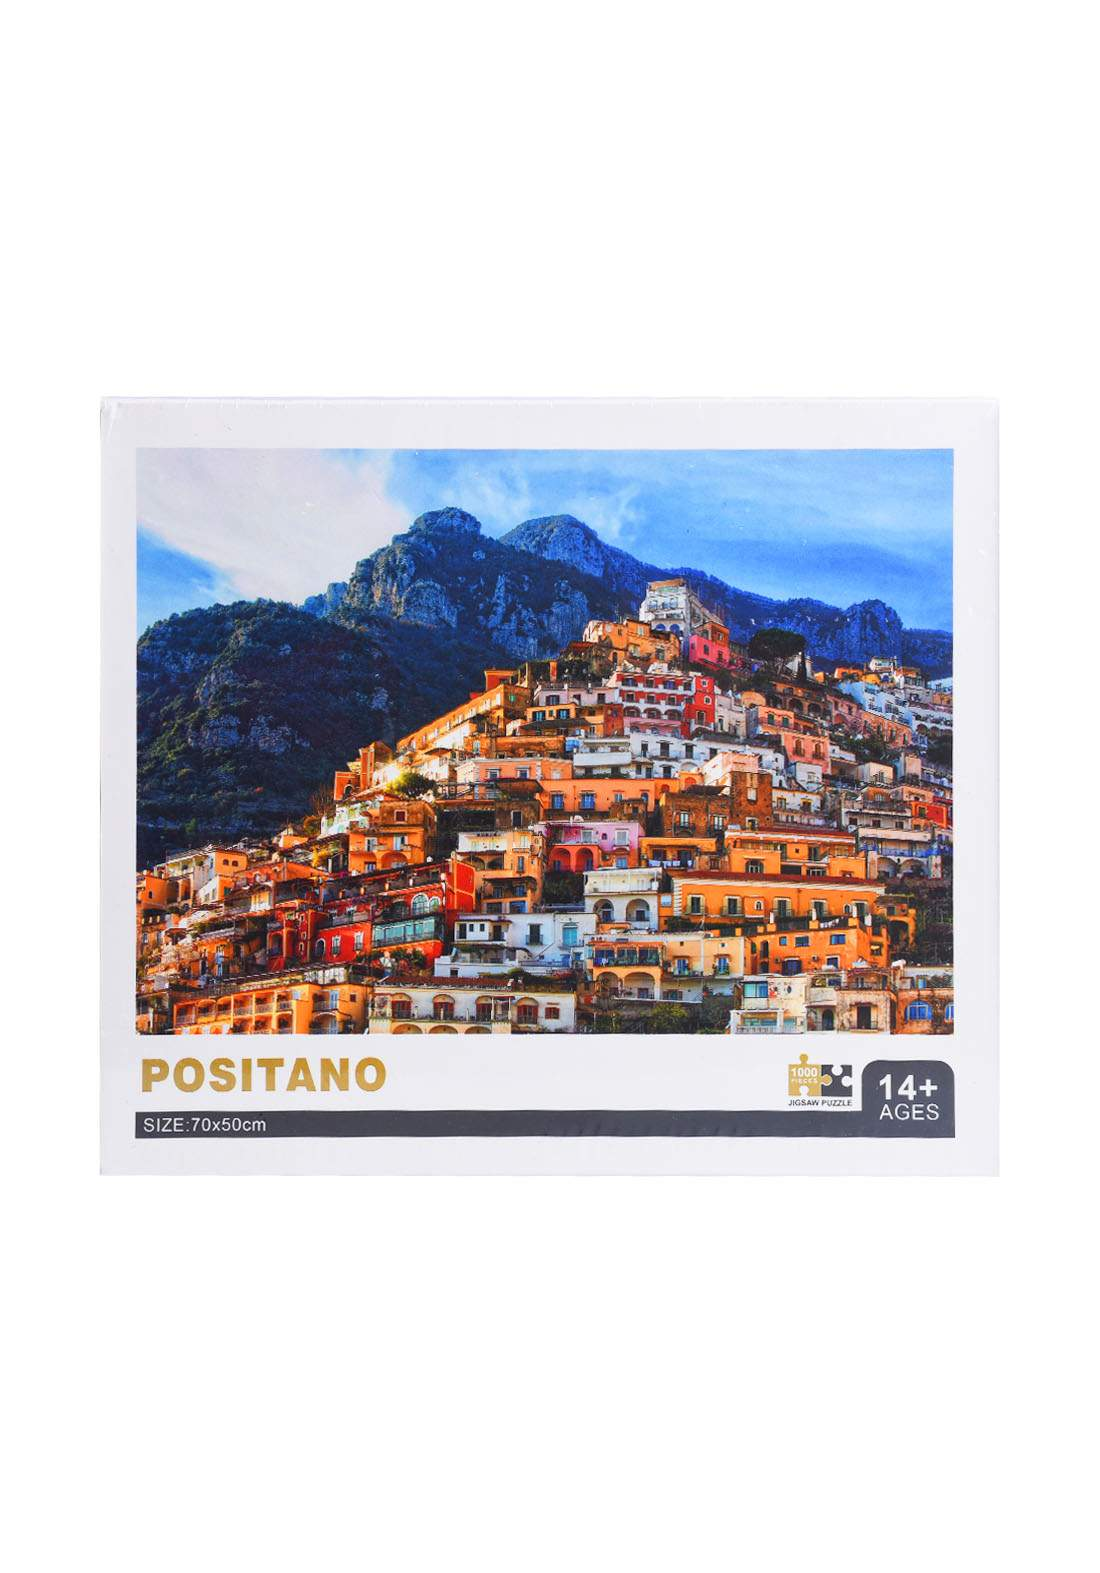 Jigsaw Puzzle Positano 1000Pcs لعبة تركيب القطع بشكل بوسيتانو